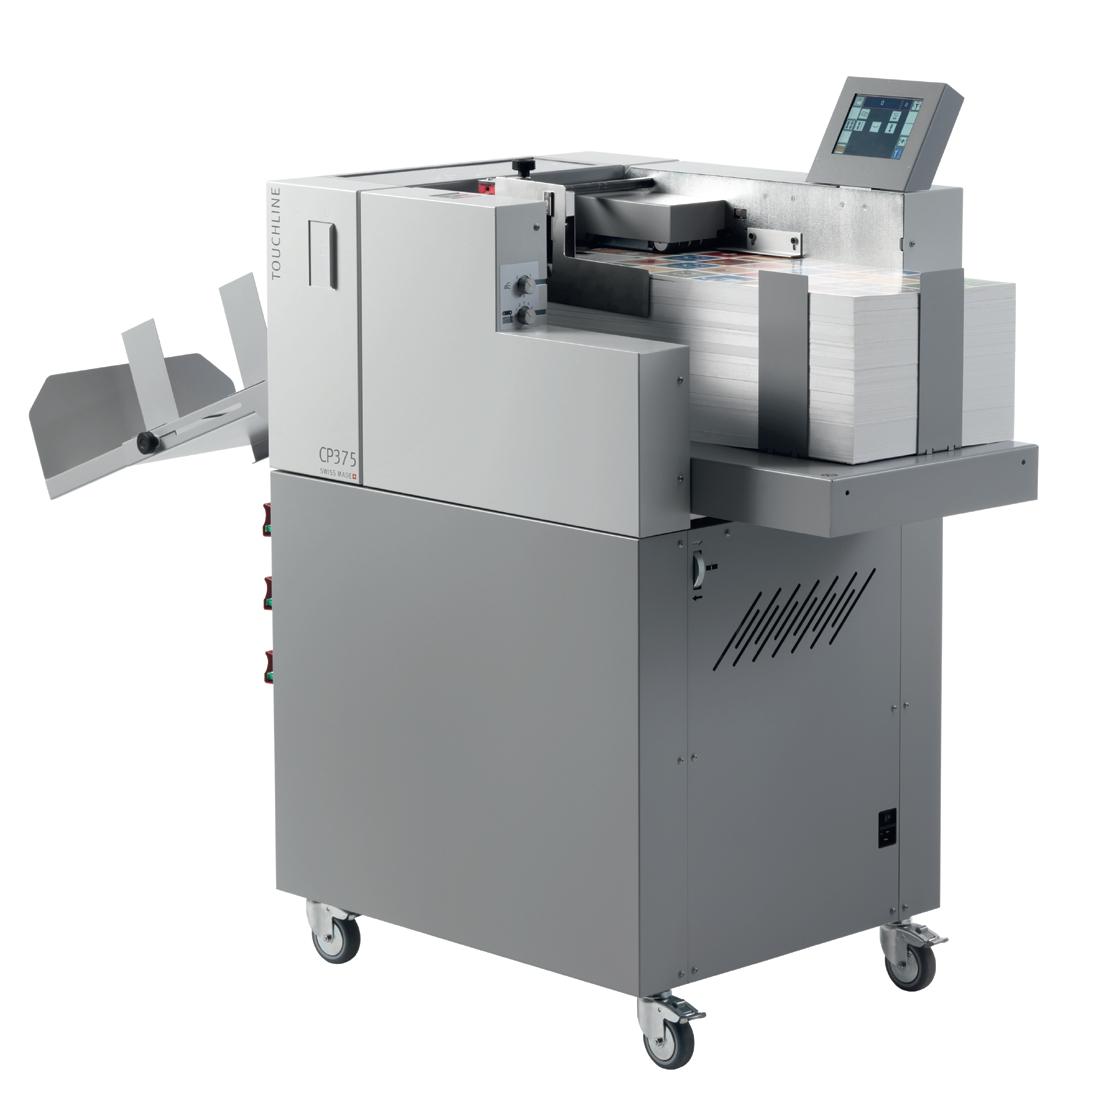 Bigówko-perforator CP-375DUO